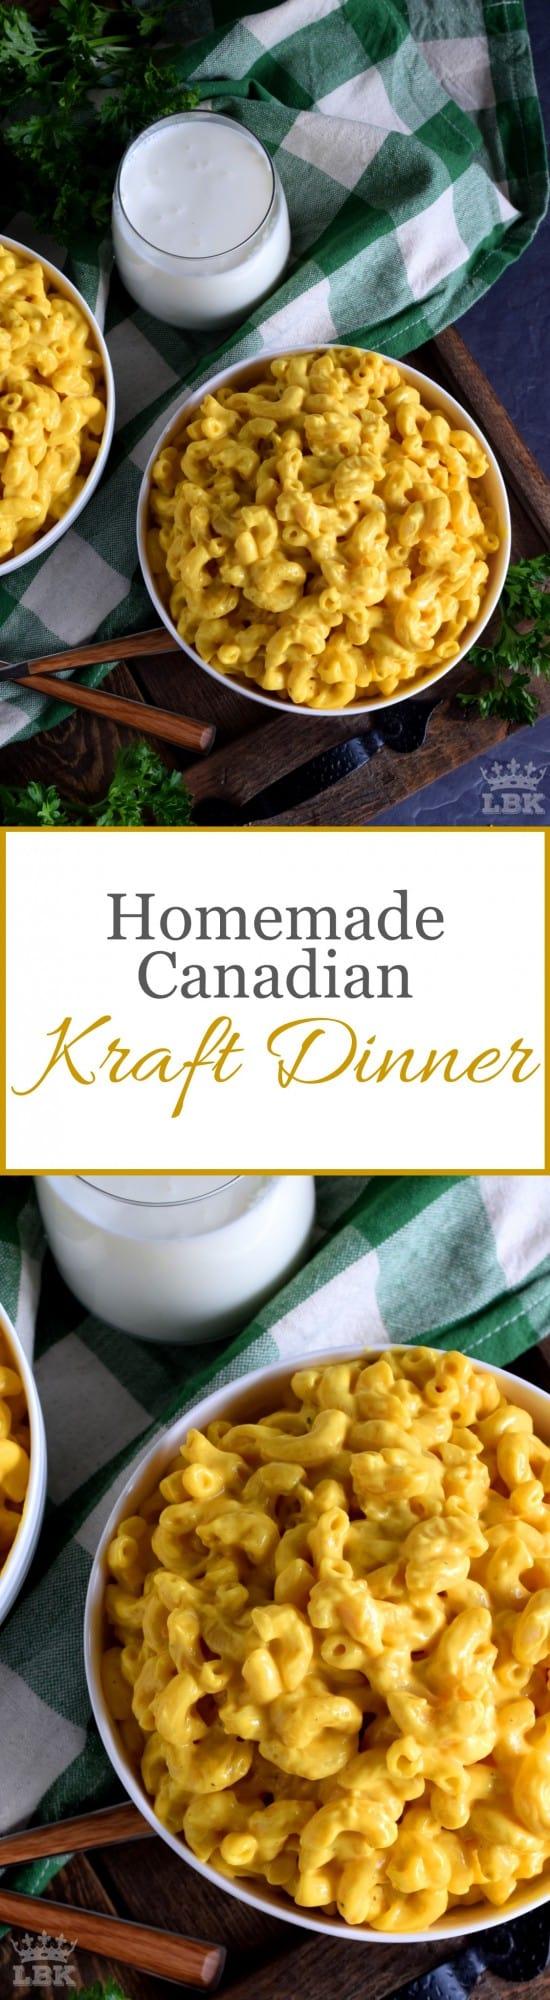 Homemade Canadian Kraft Dinner